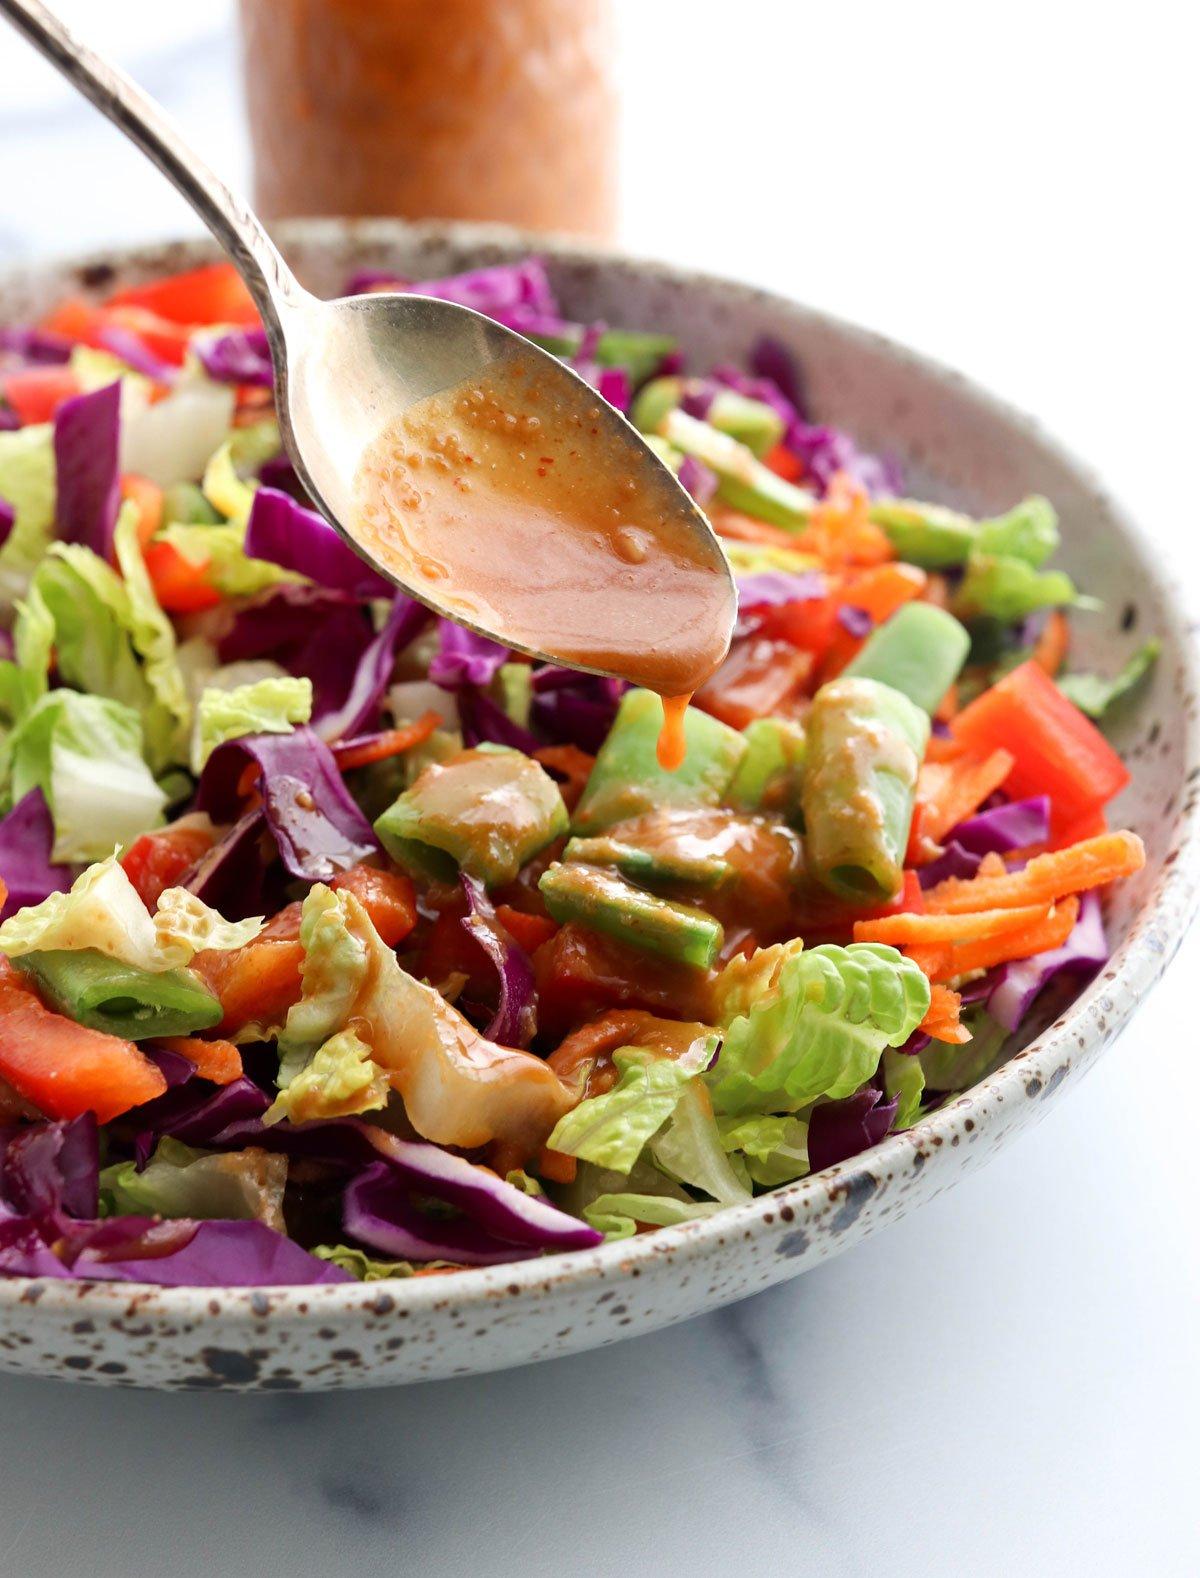 peanut dressing poured over salad